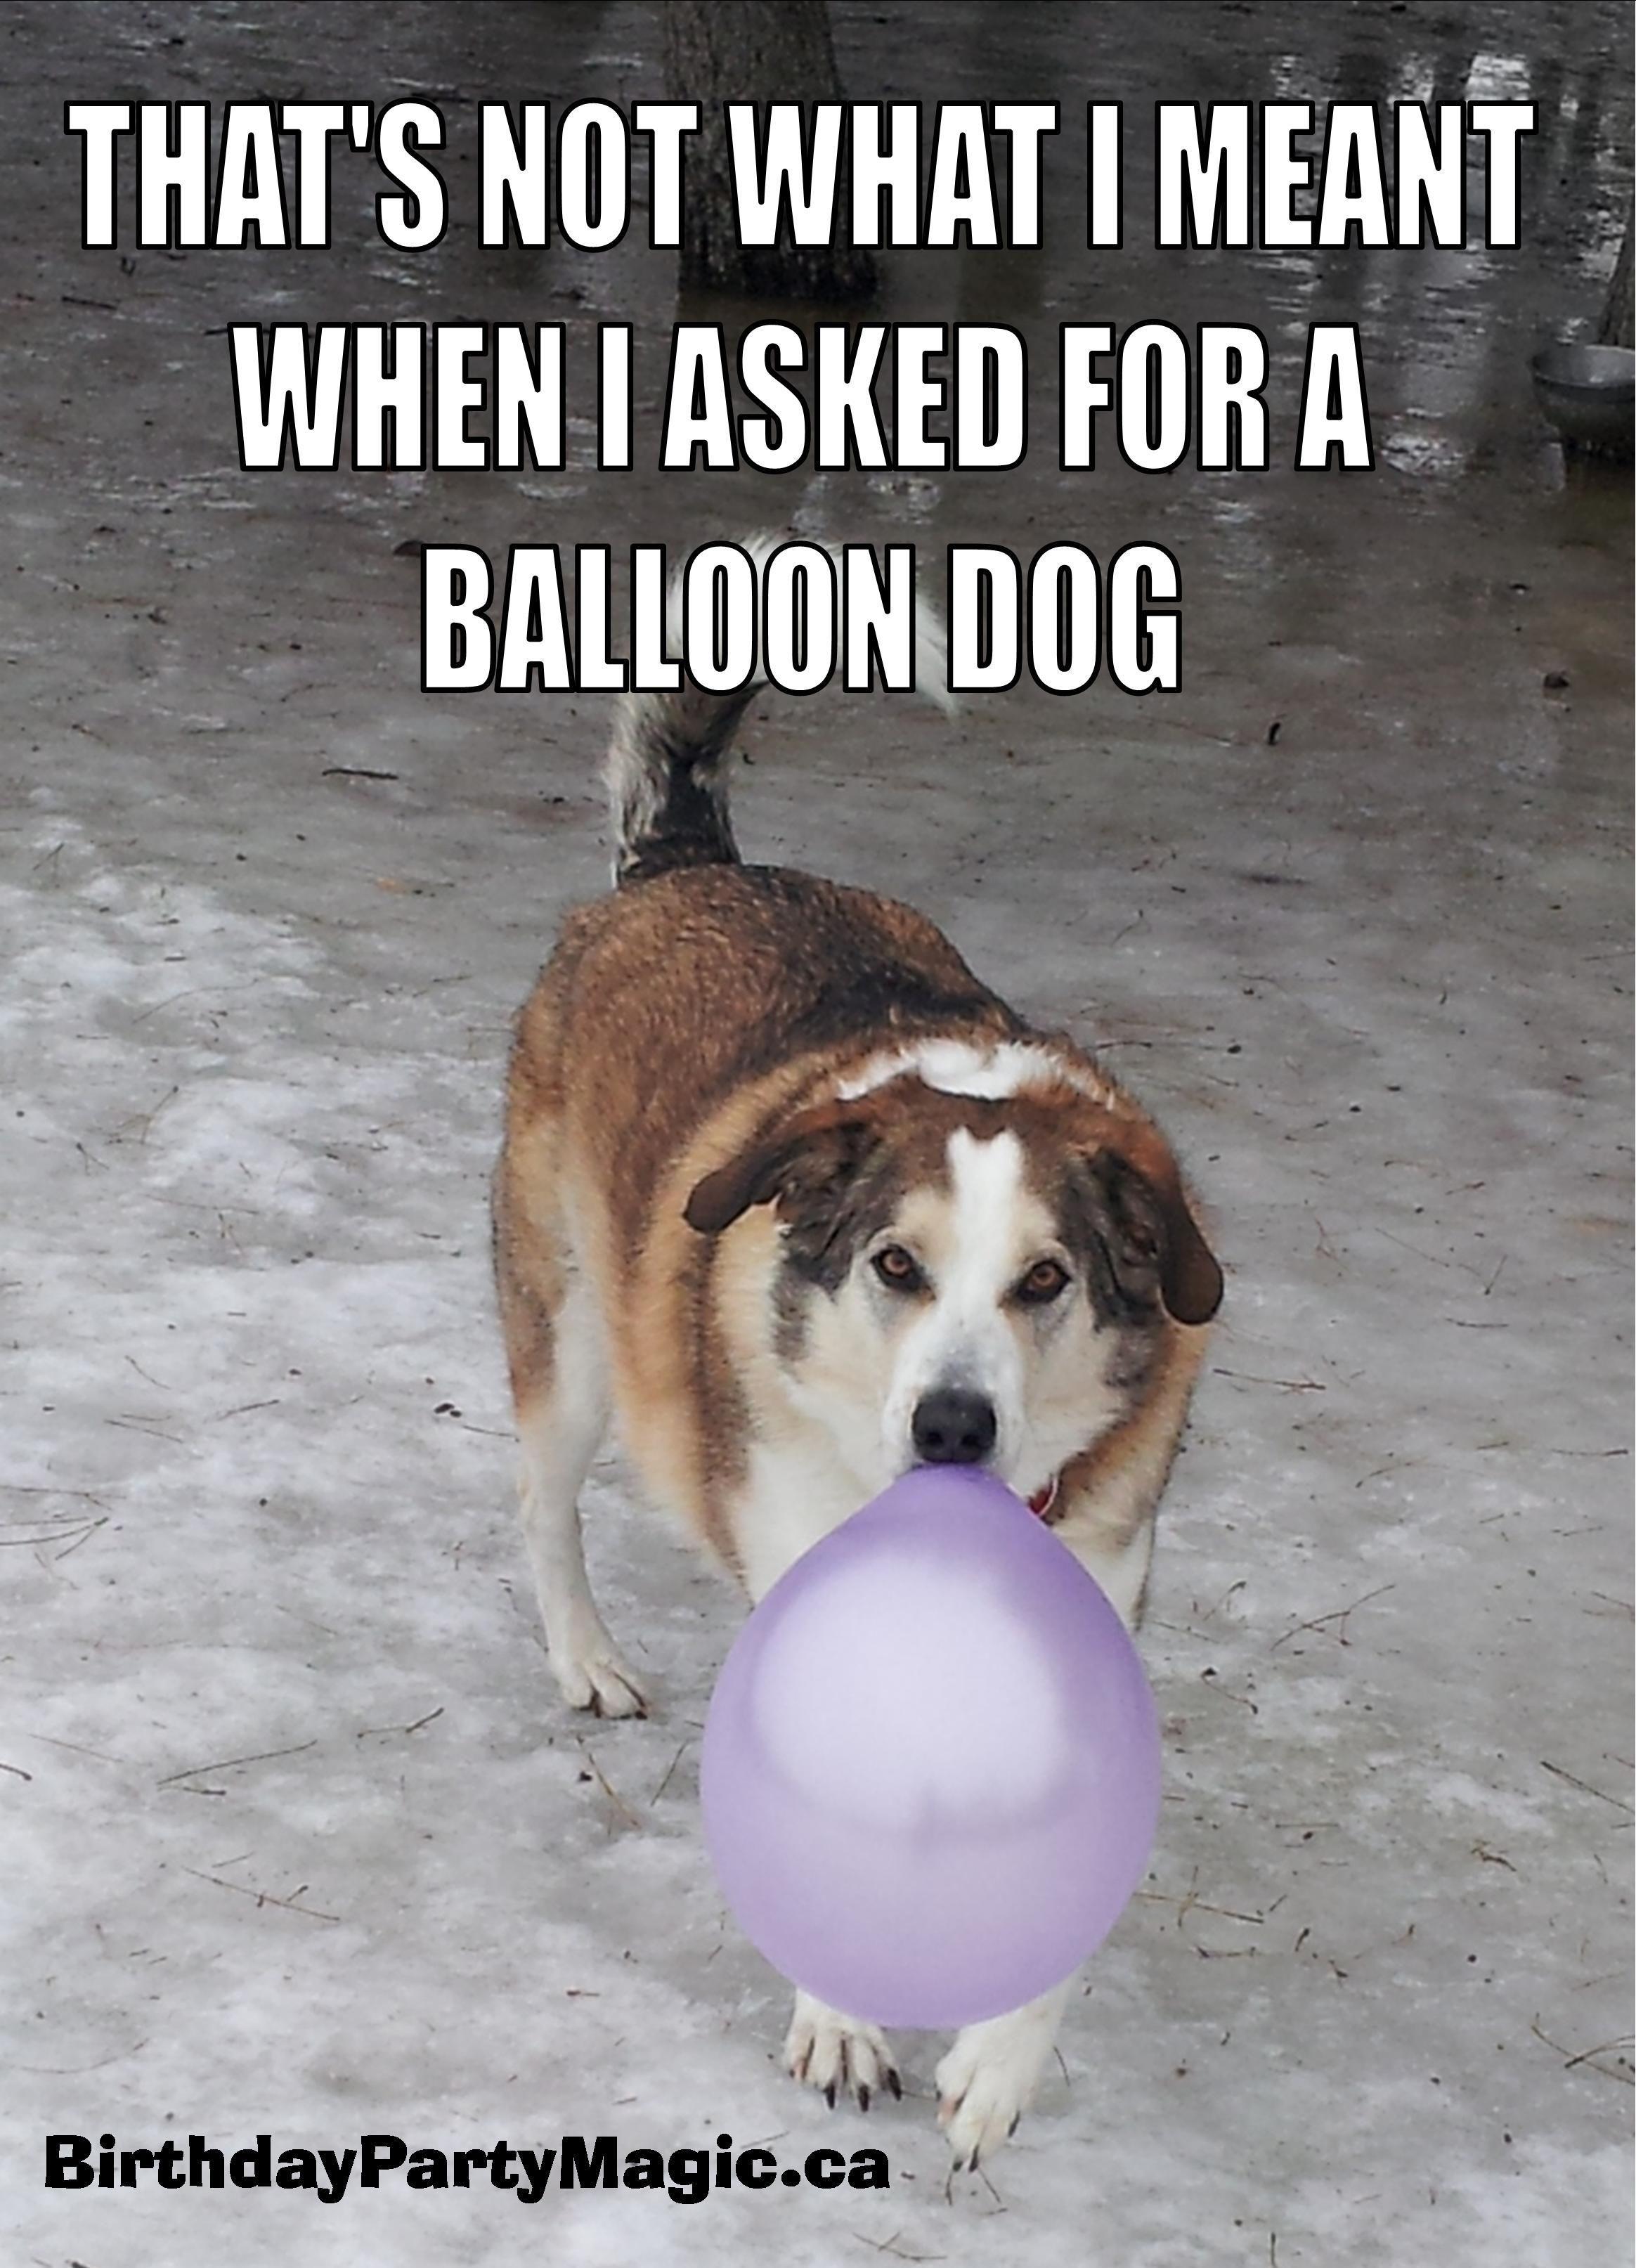 Balloon Dog Meme Balloon dog, Dog memes, Balloons